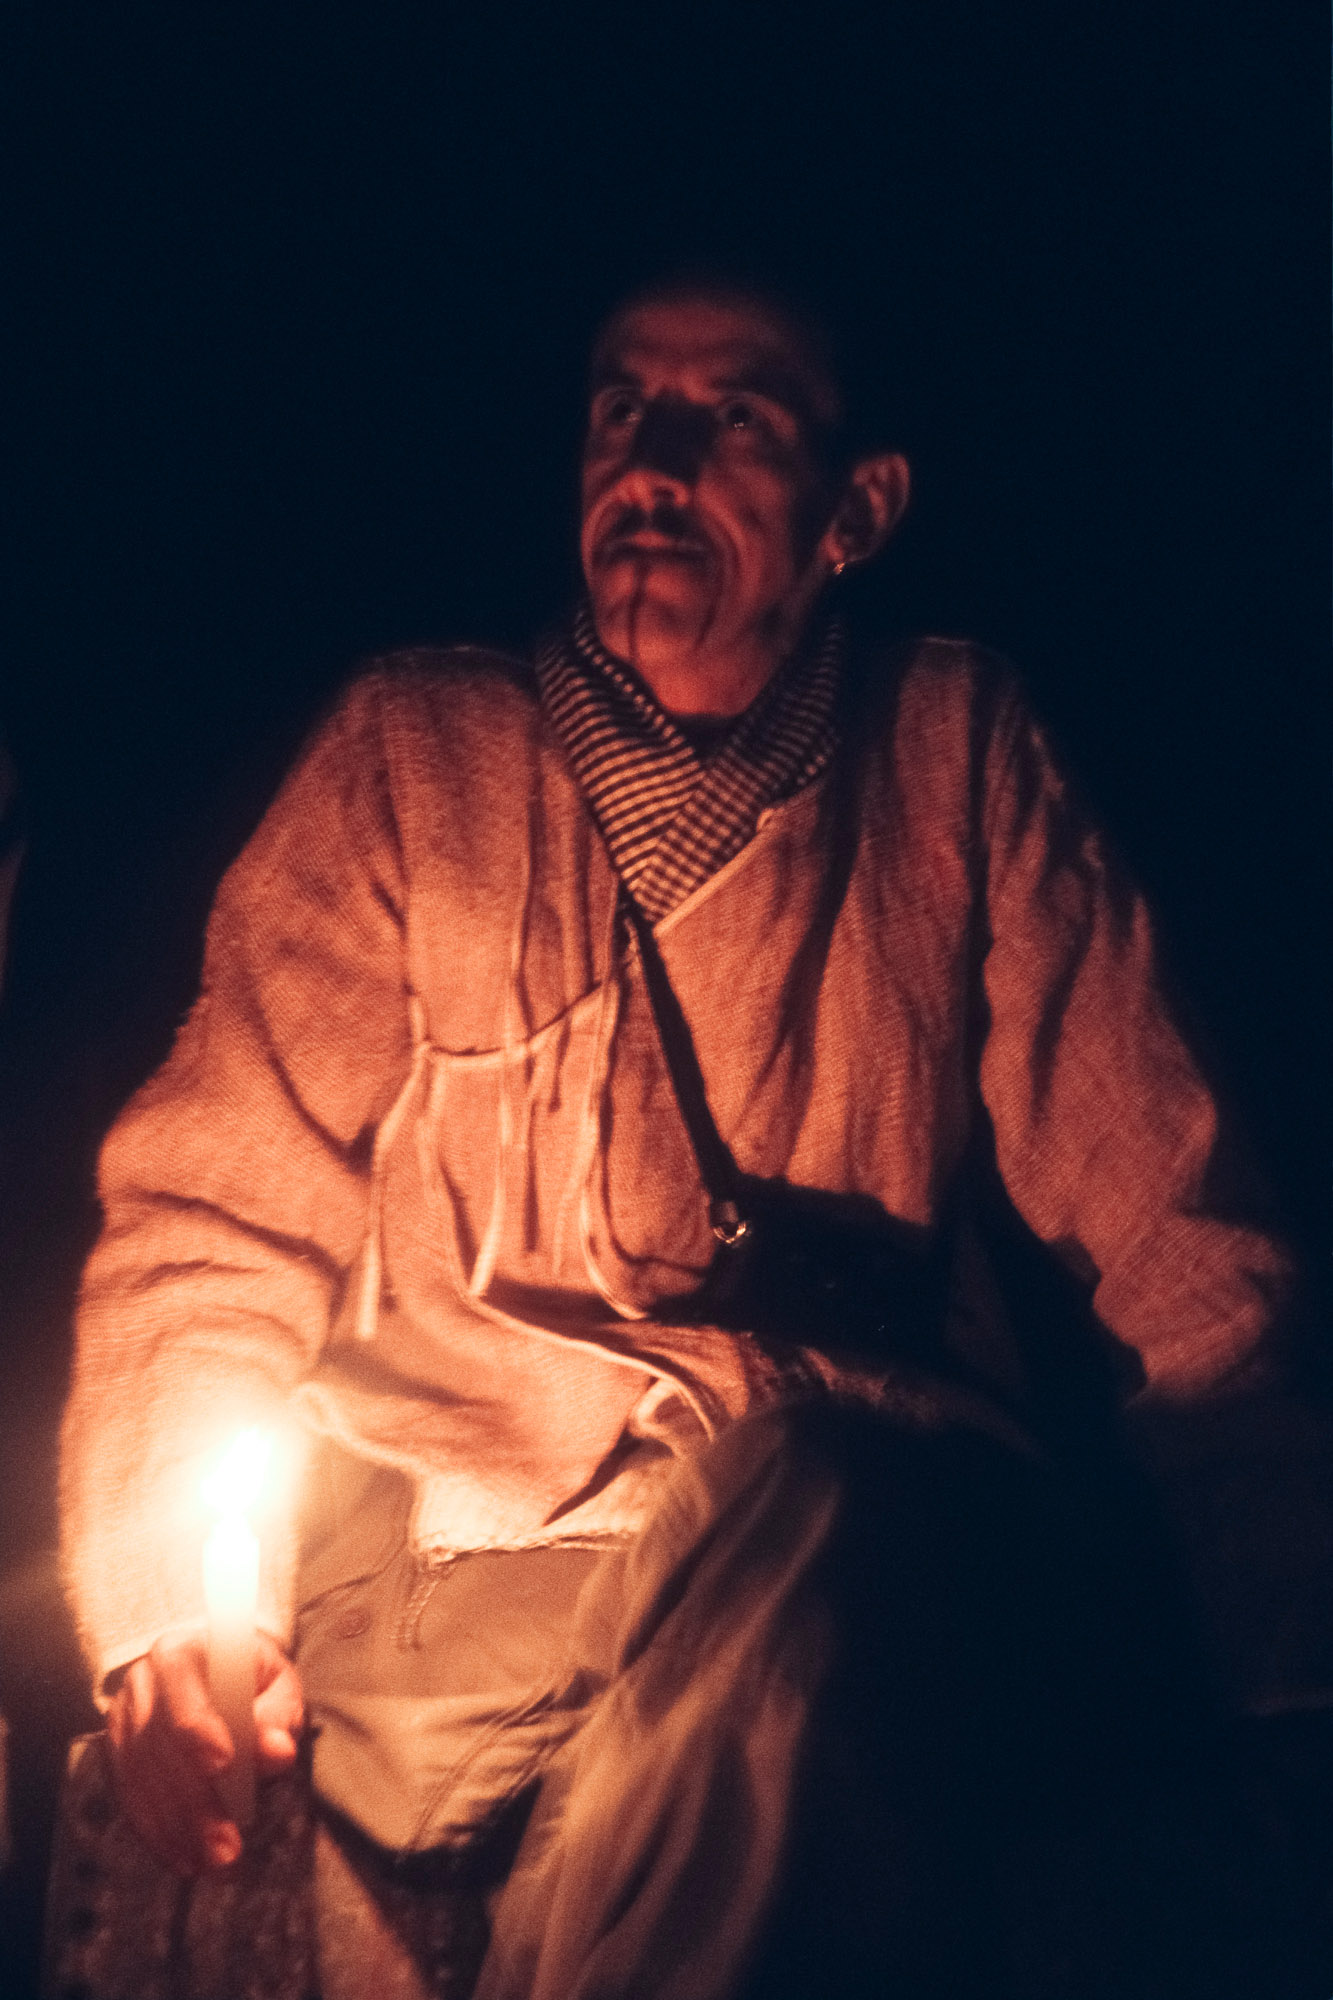 Philip Blenkinsop, Kathmandu, Nepal, April 2008